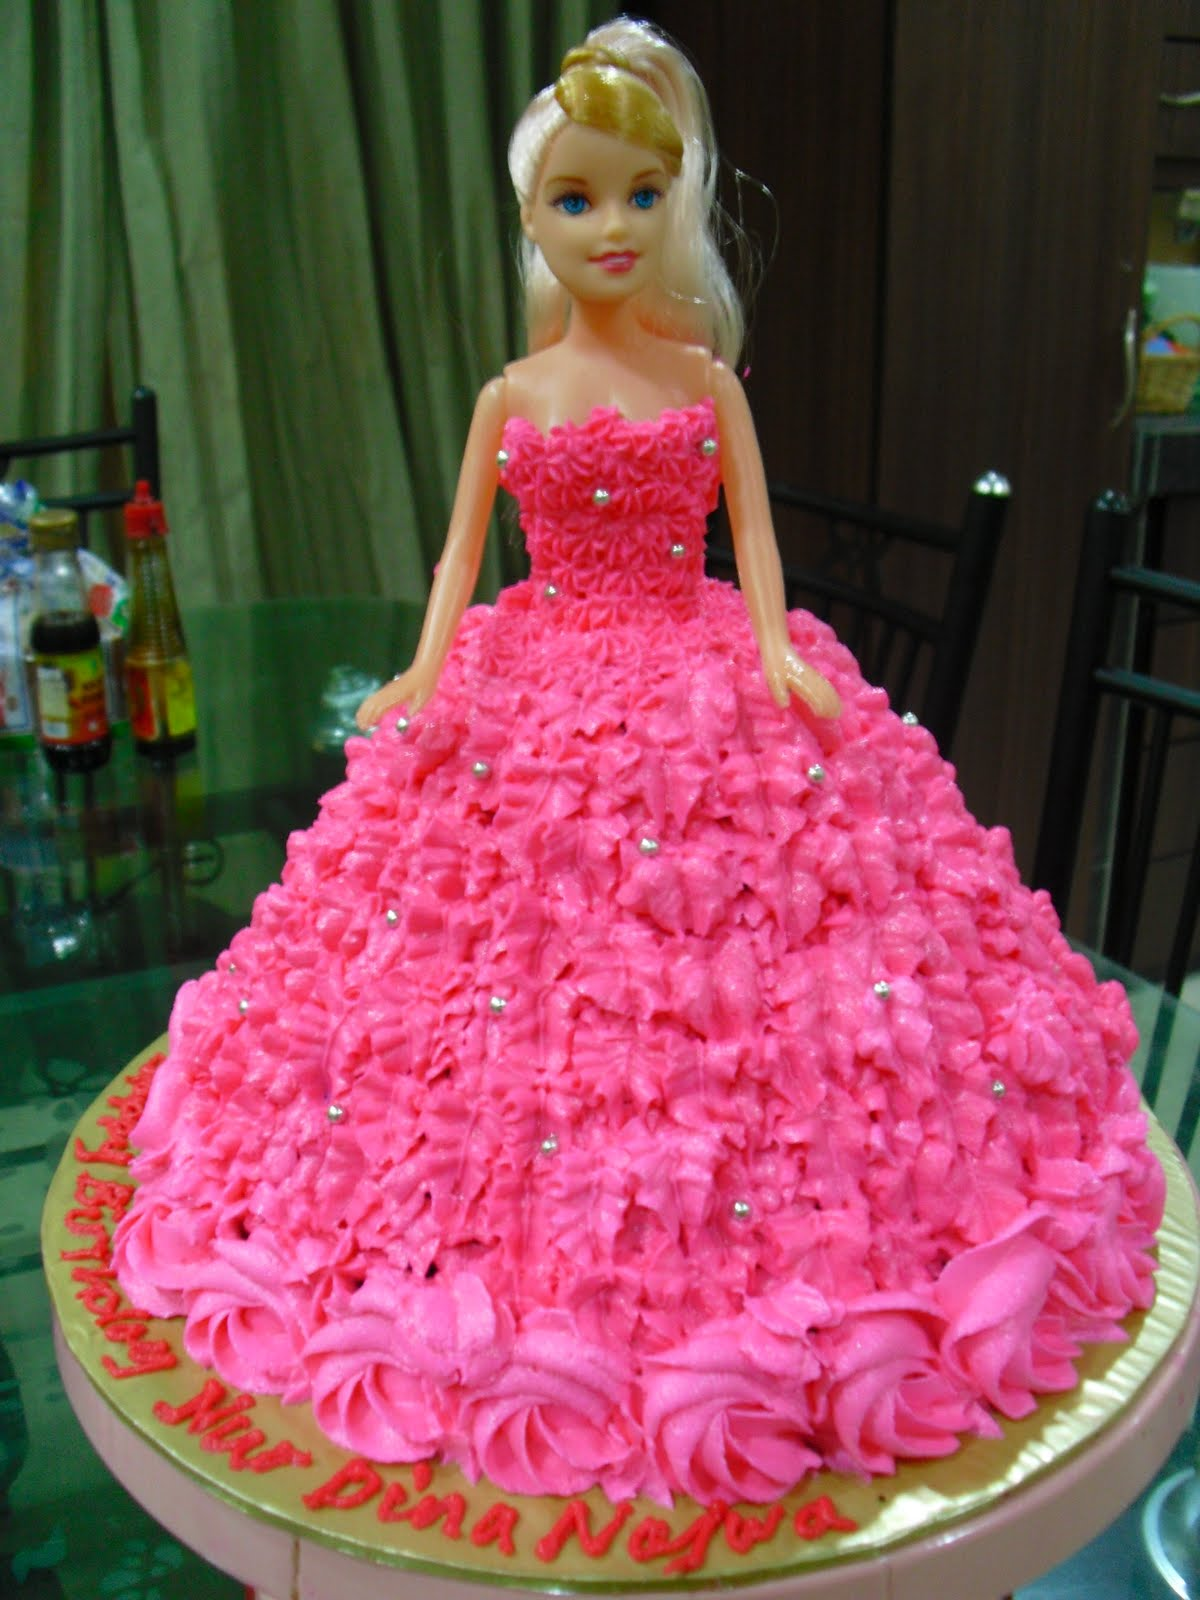 Doll Birthday Cakes